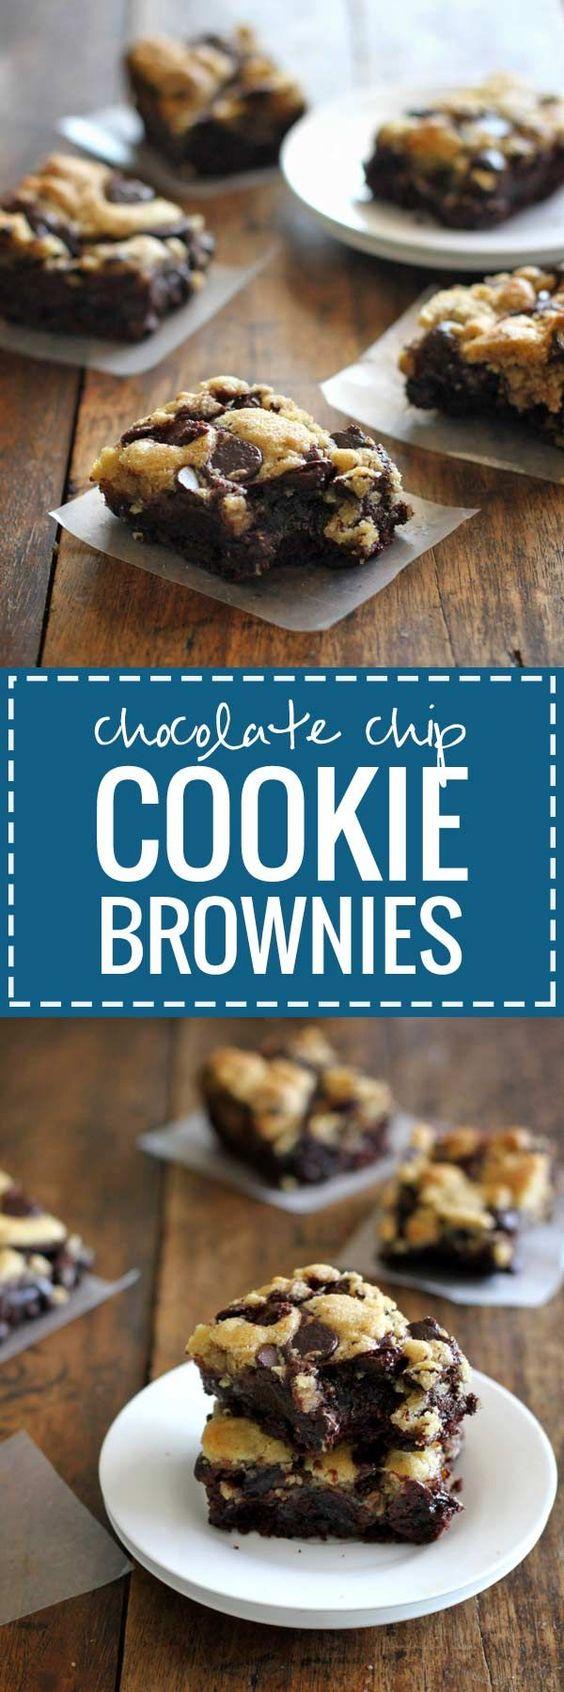 ... cookie dough brownies the top desserts cookie dough fudgy brownies